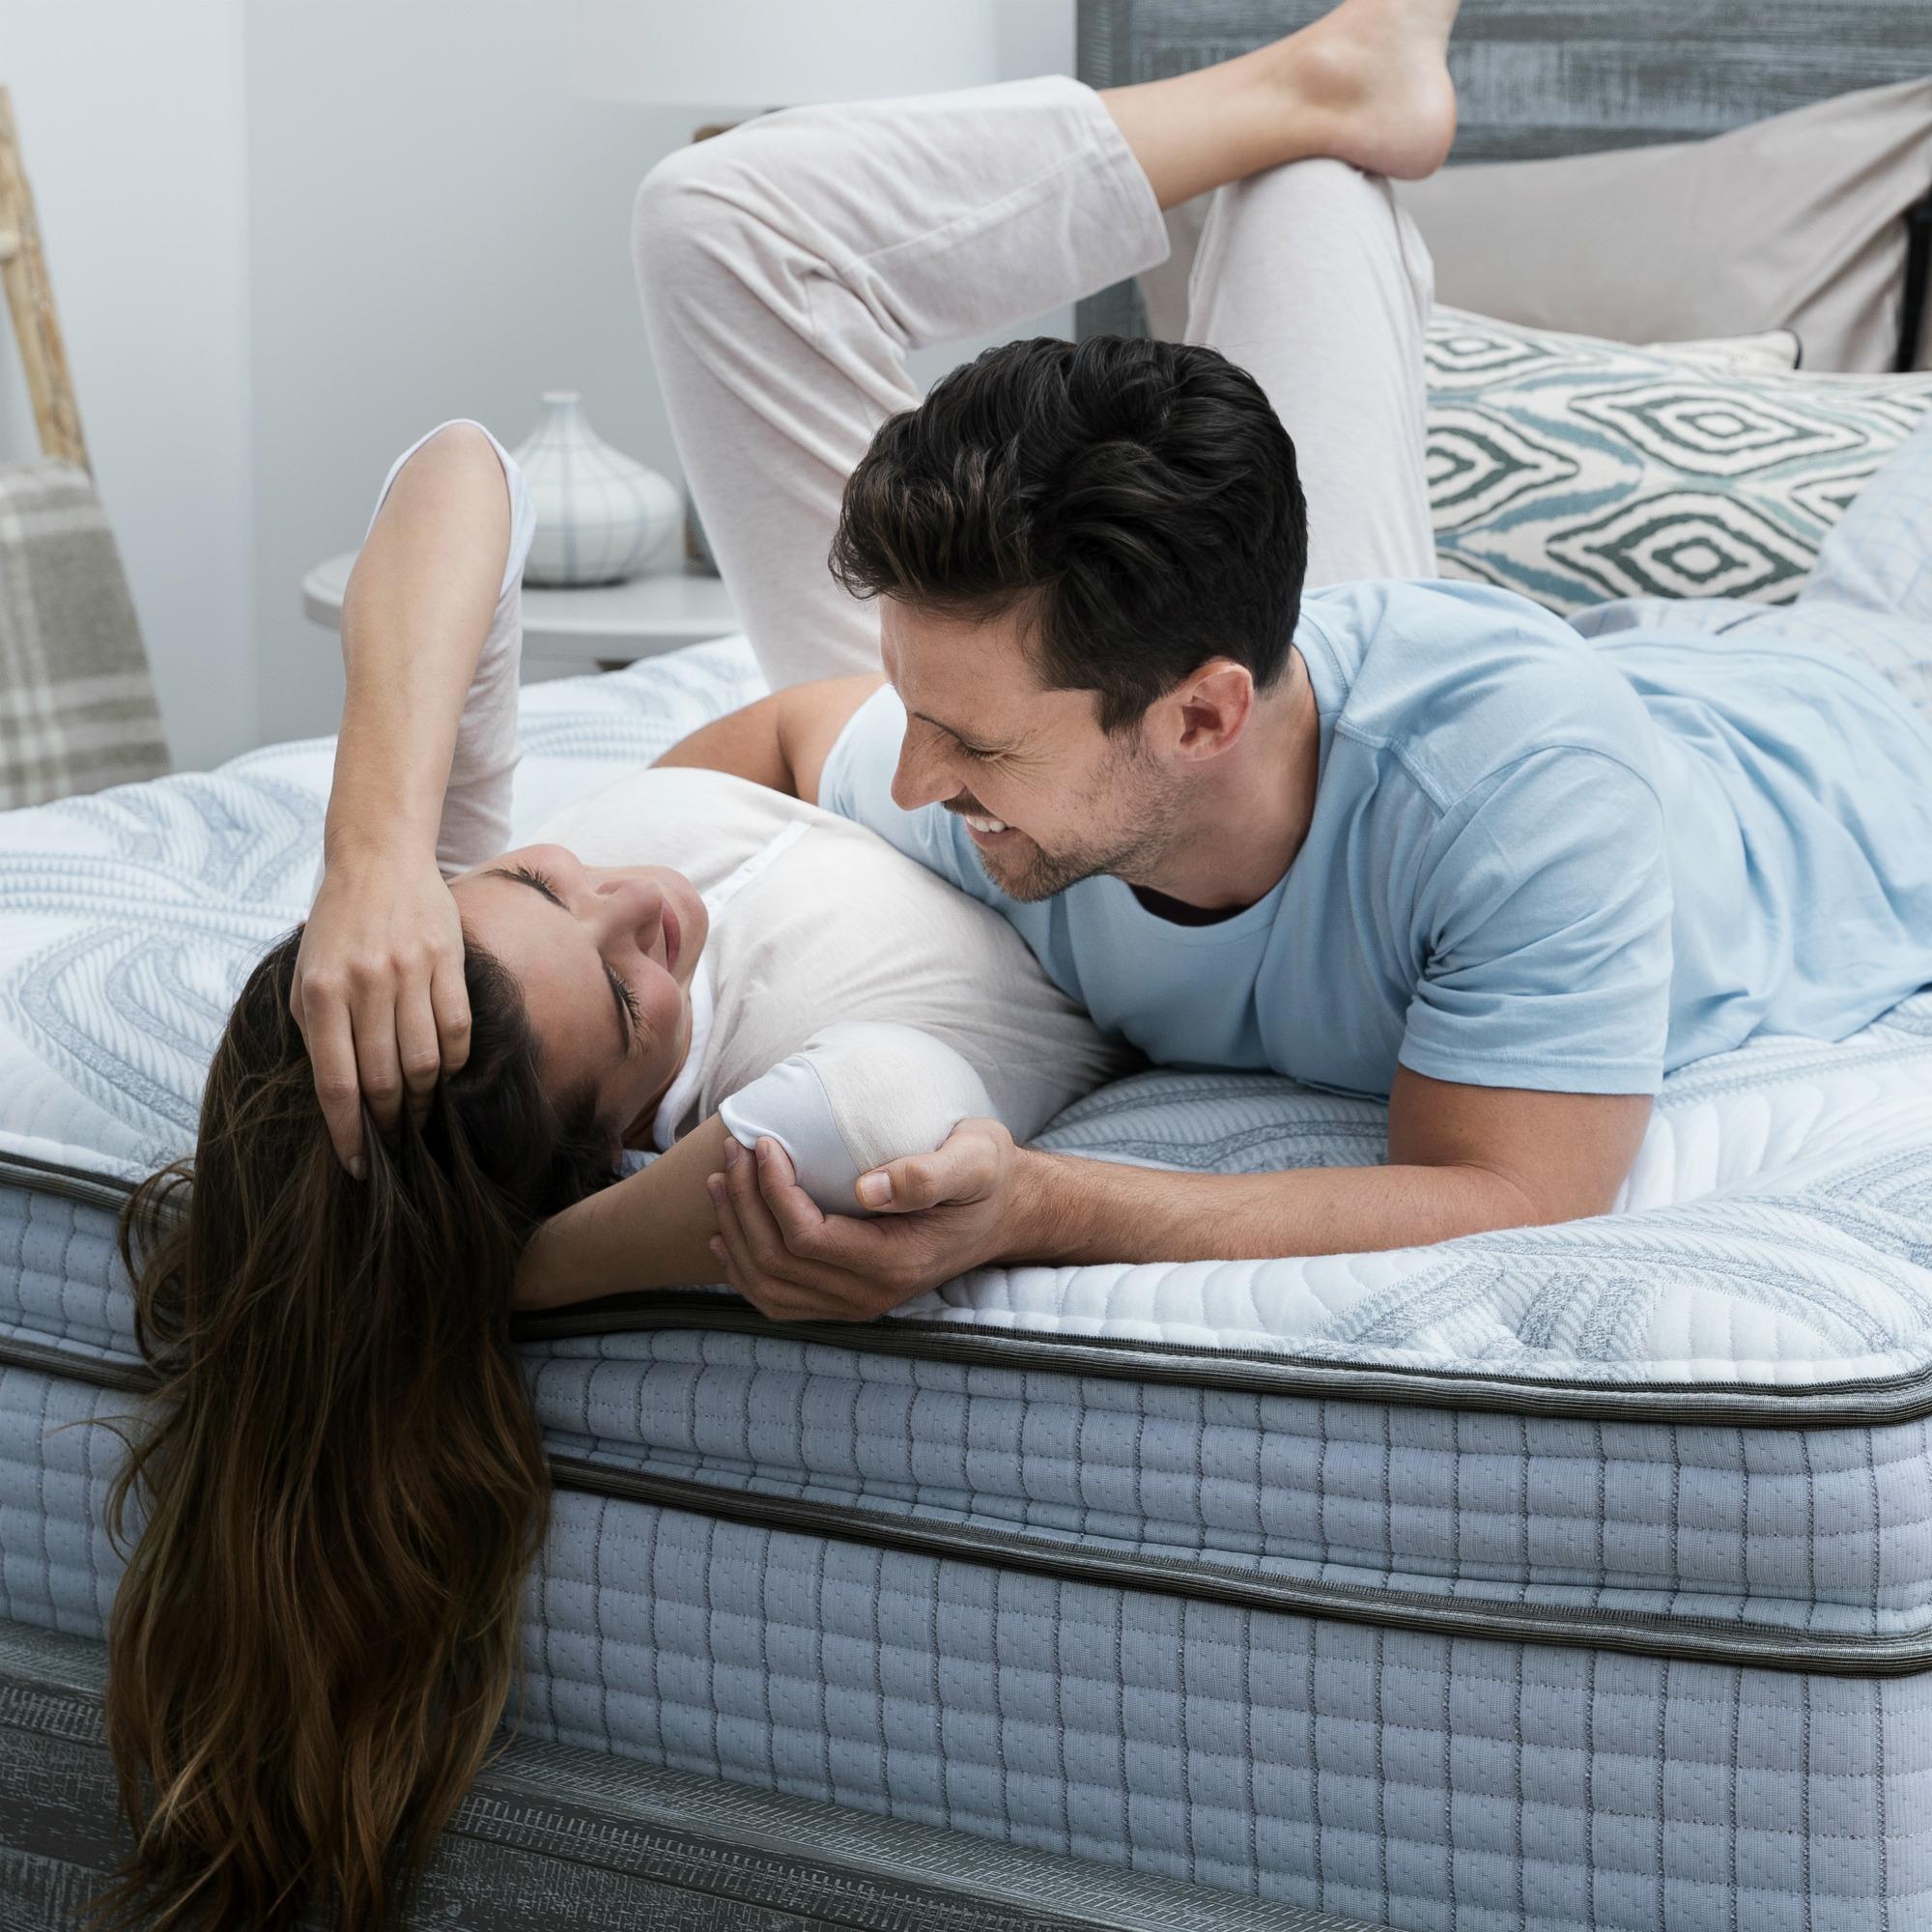 top lightbox restonic warehouse therapedic luxury mattress innergy pillow luxe reviews flint product